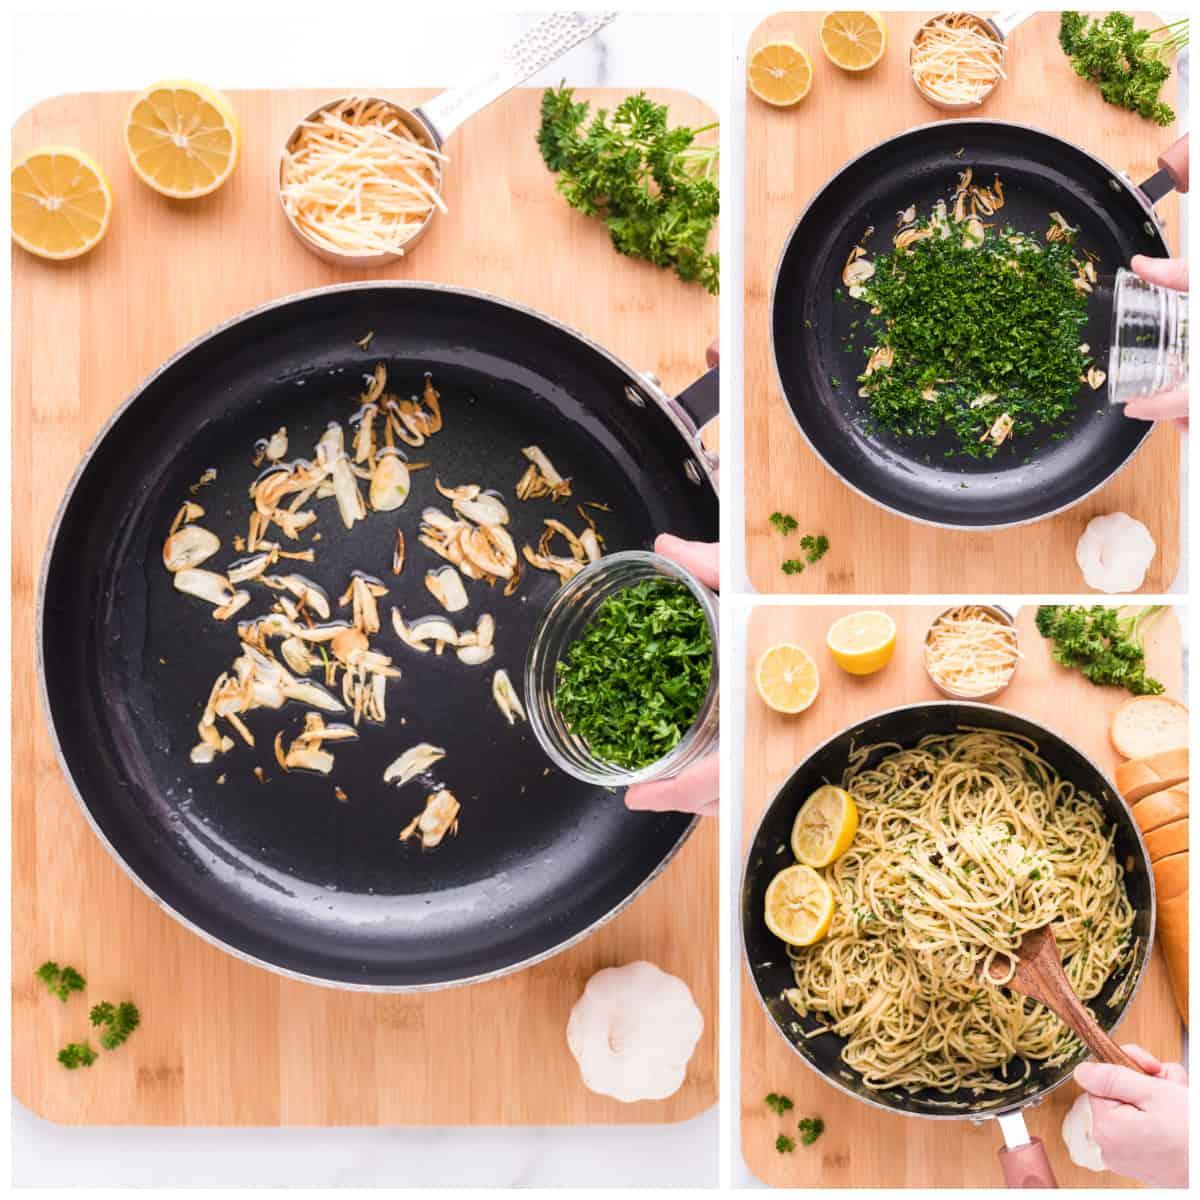 Step by step photos on how to make Spaghetti Aglio e Olio.